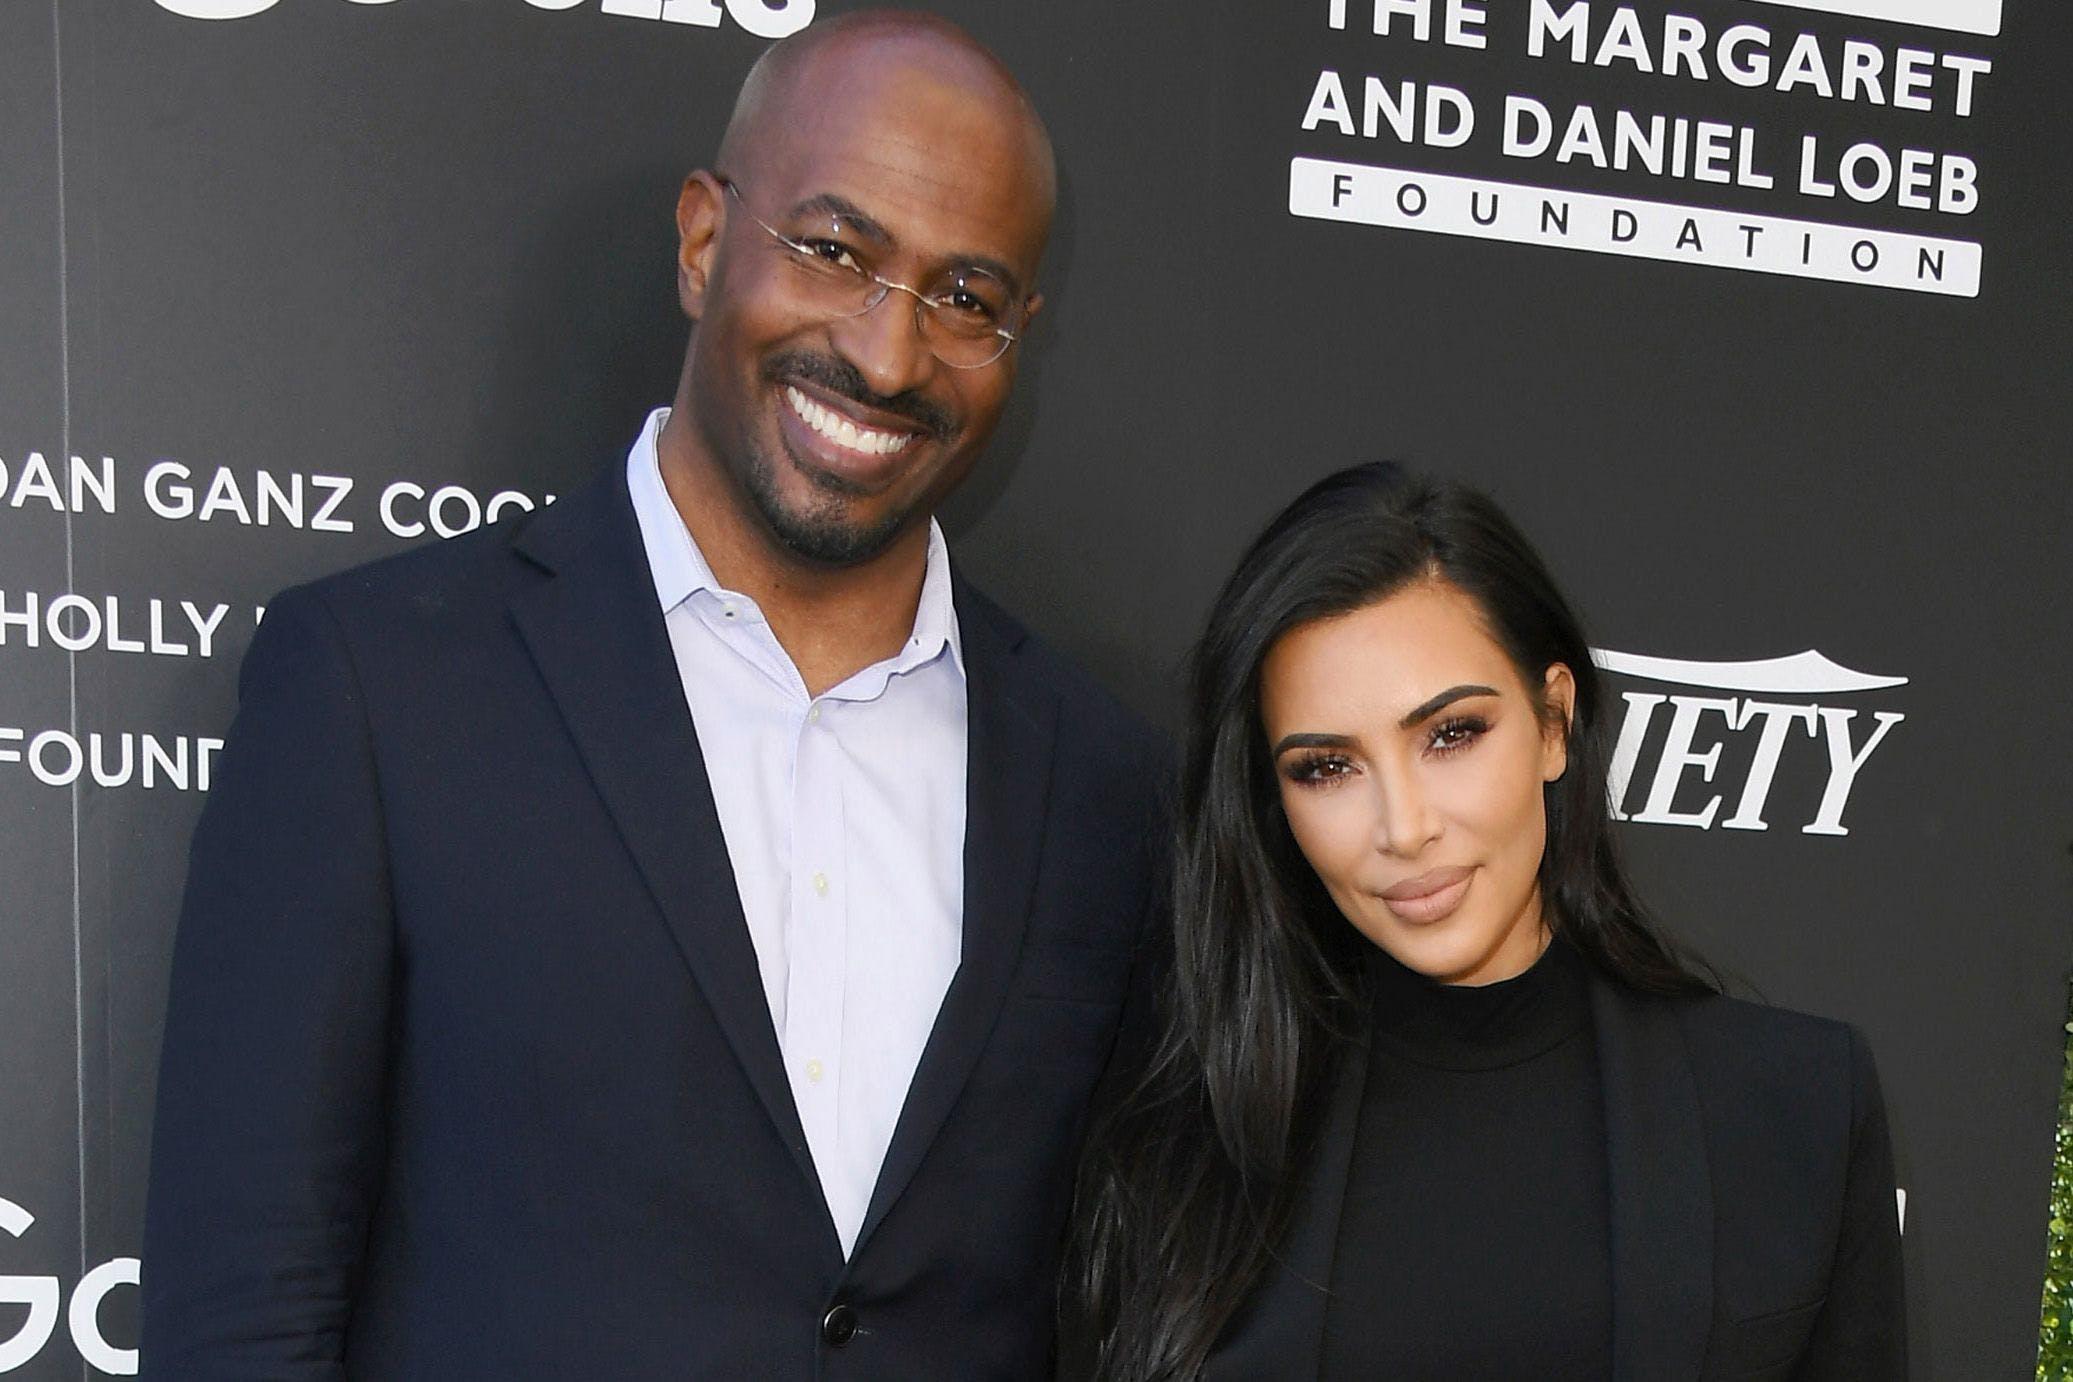 Soulja Boy and Kim Kardashian photo explanation